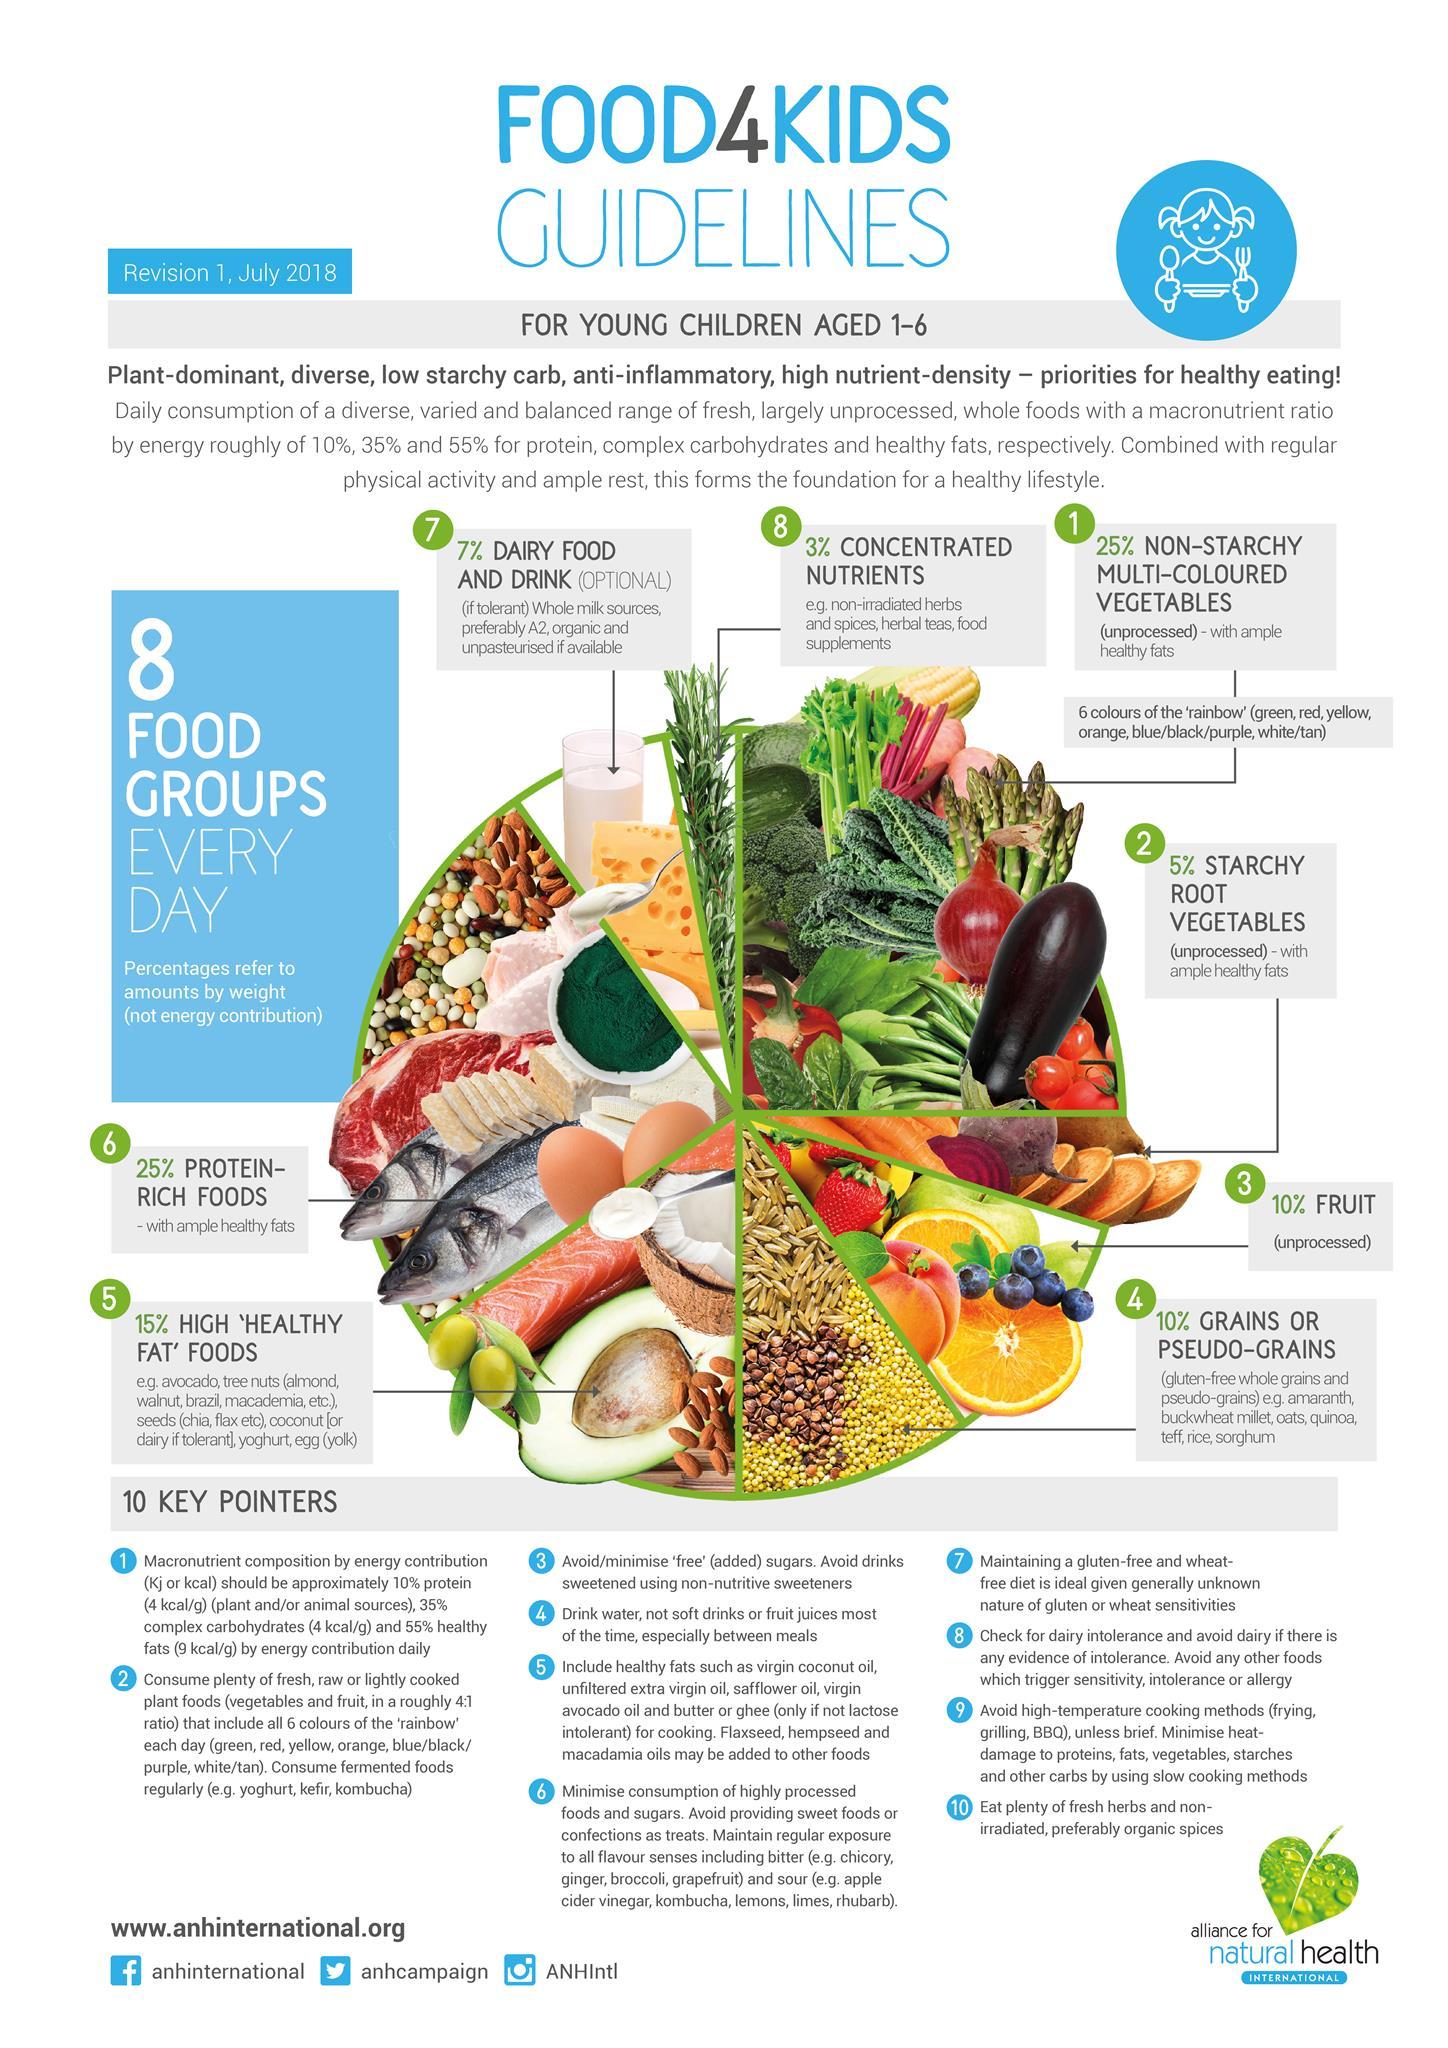 Food4kids Guidelines 2018 For Children